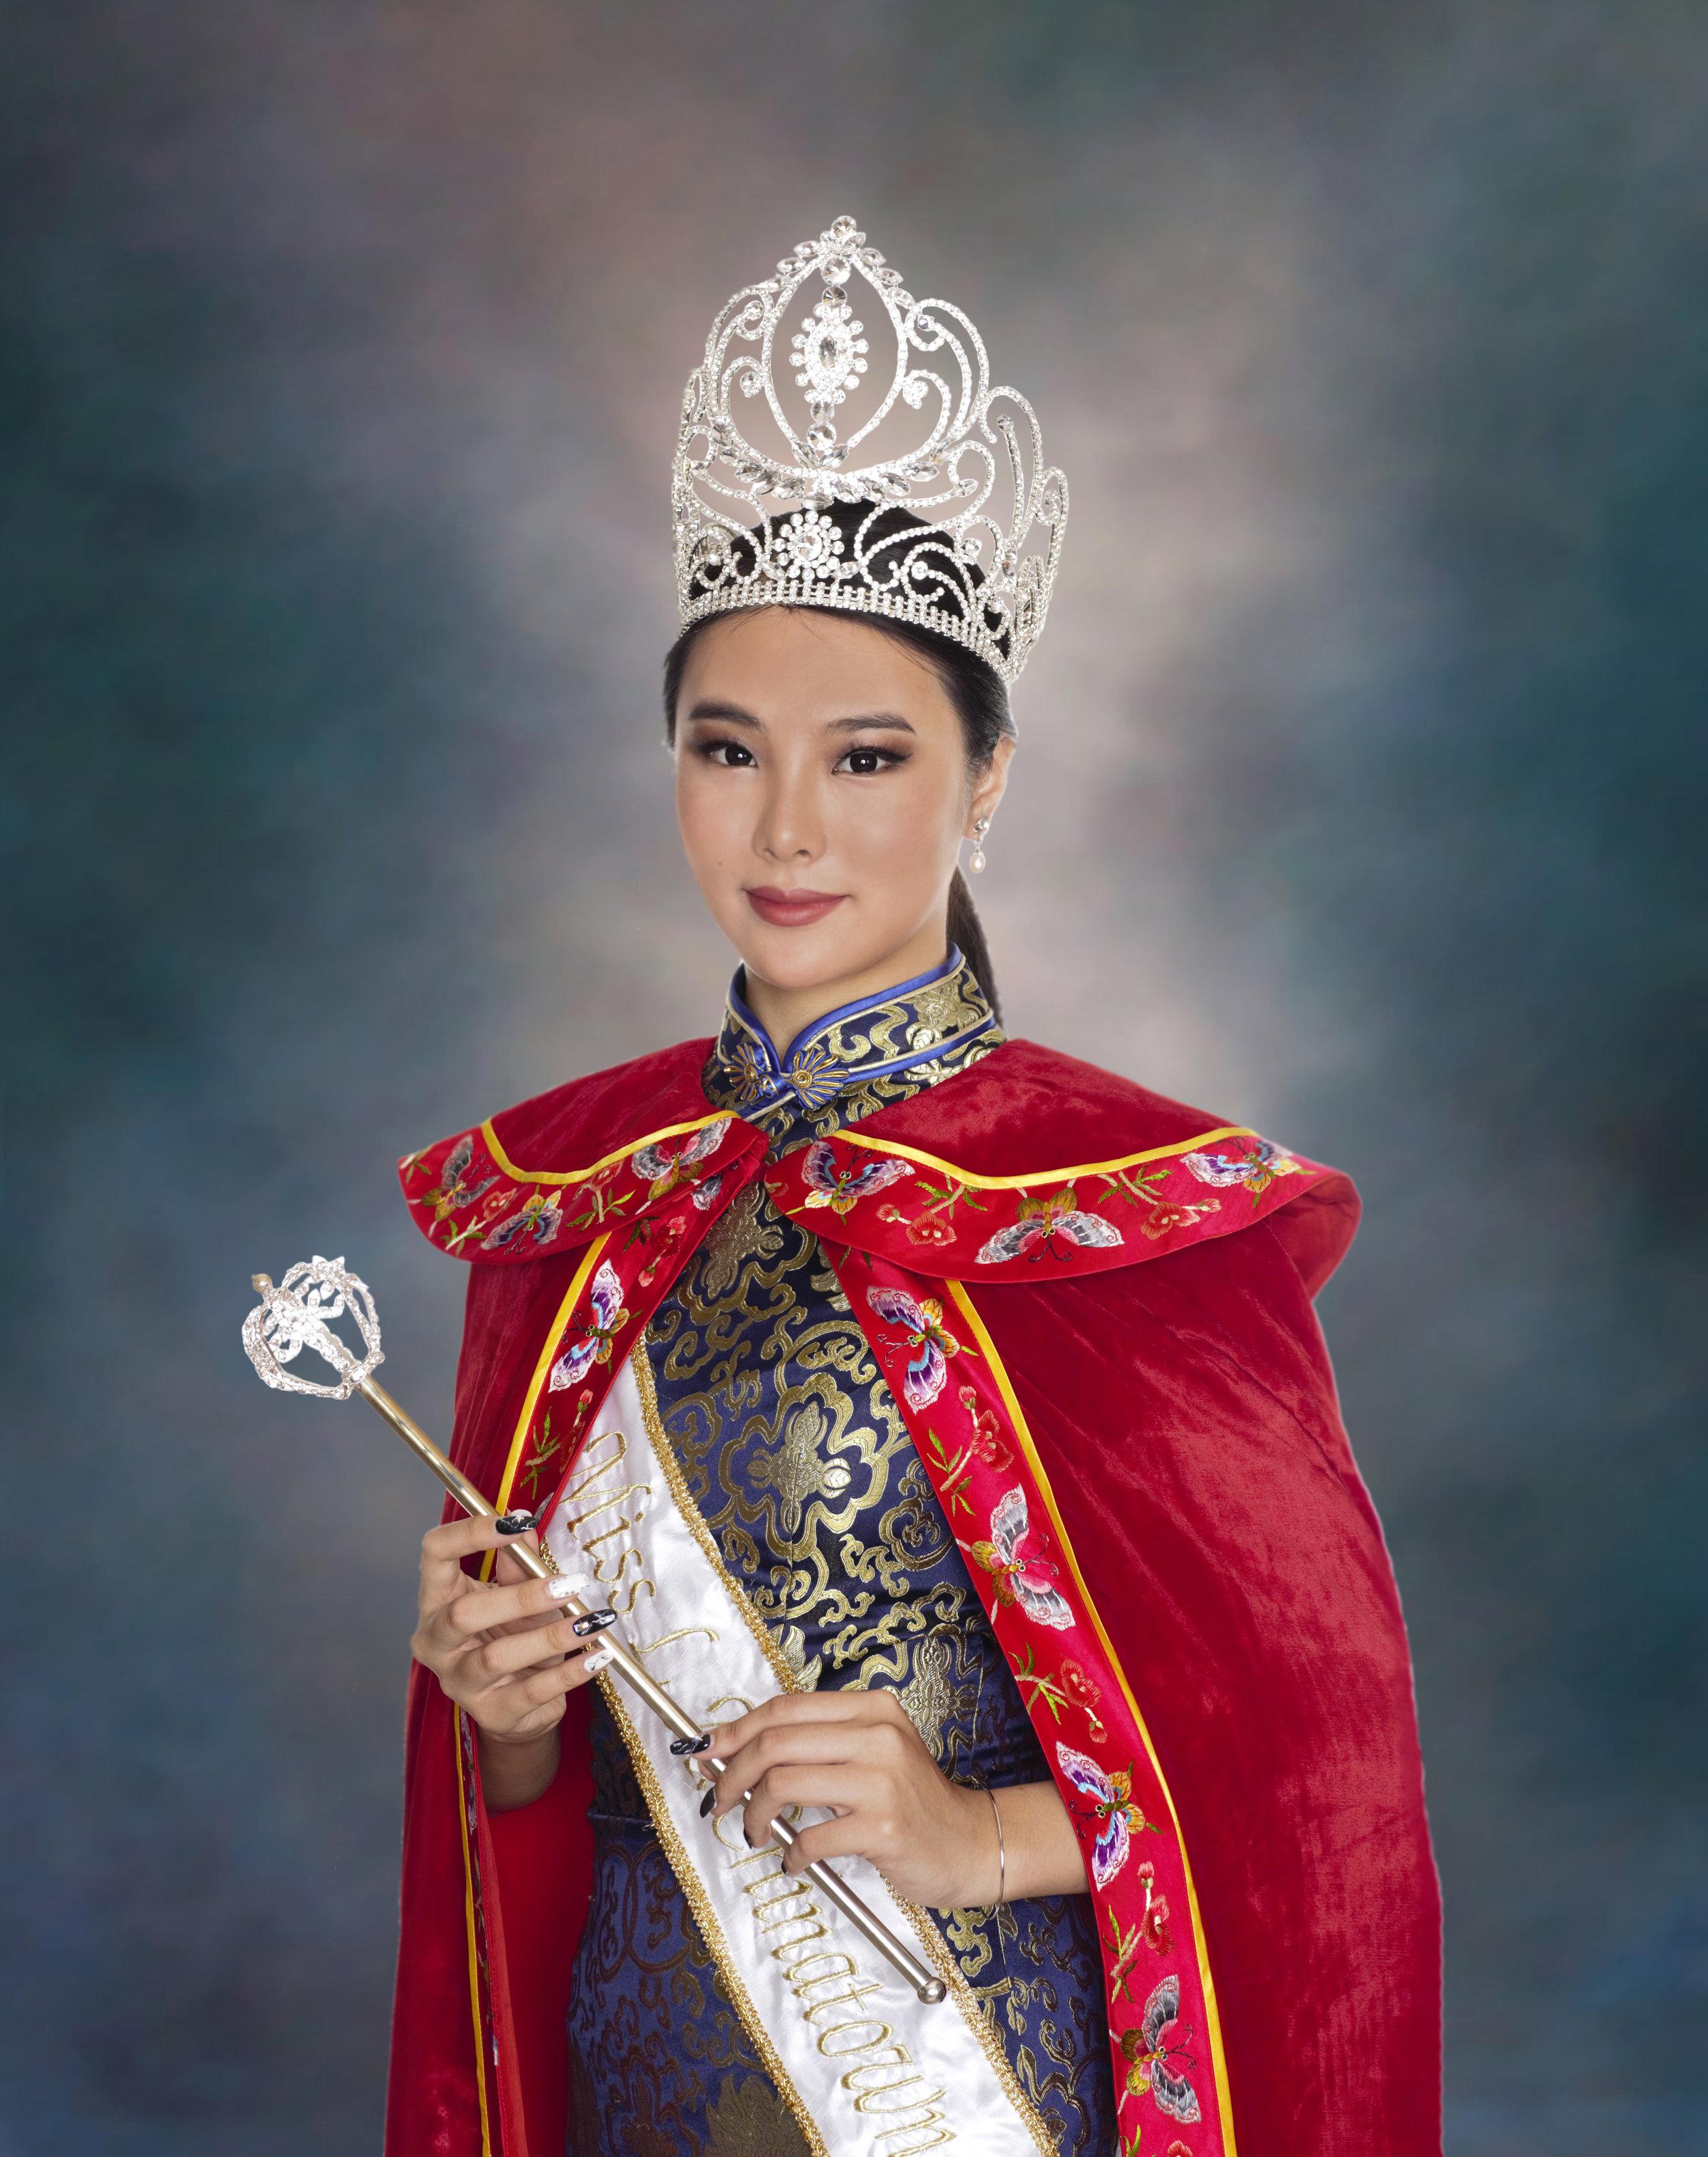 Queen and Miss Photogenic, Angela Liu